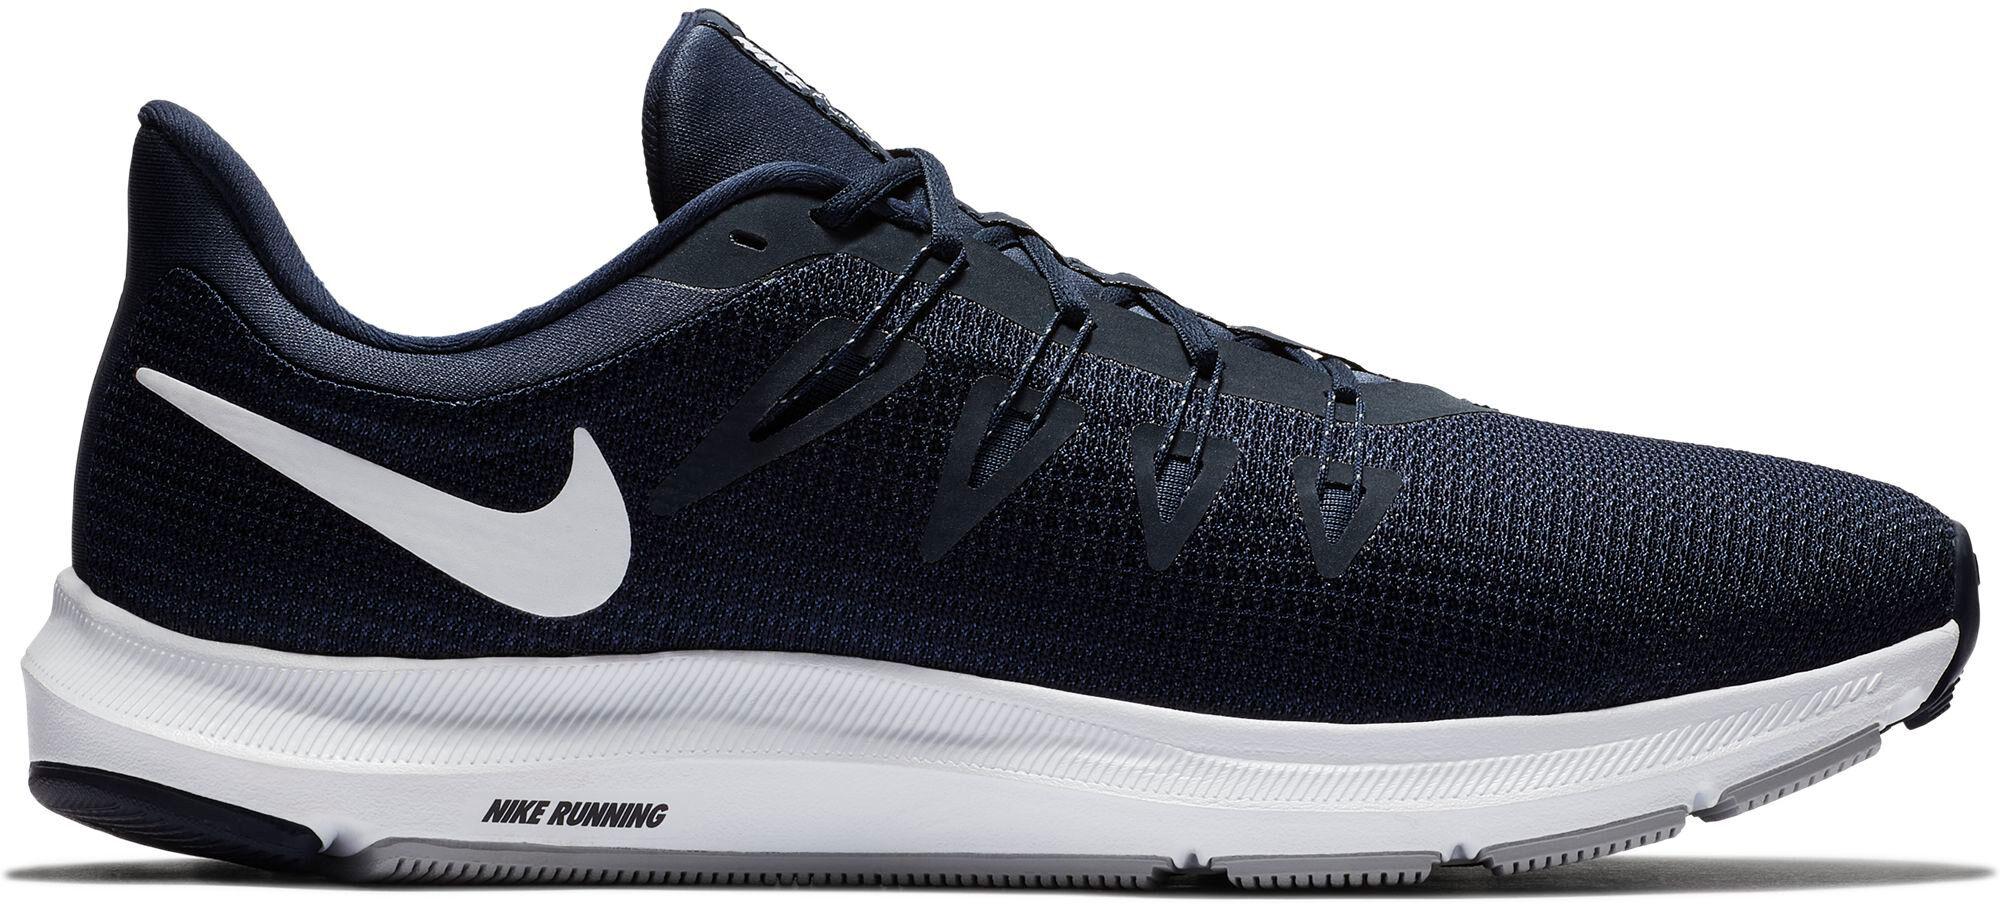 Nike Férfi Futó cipö, kék Quest, AA7403_____0400